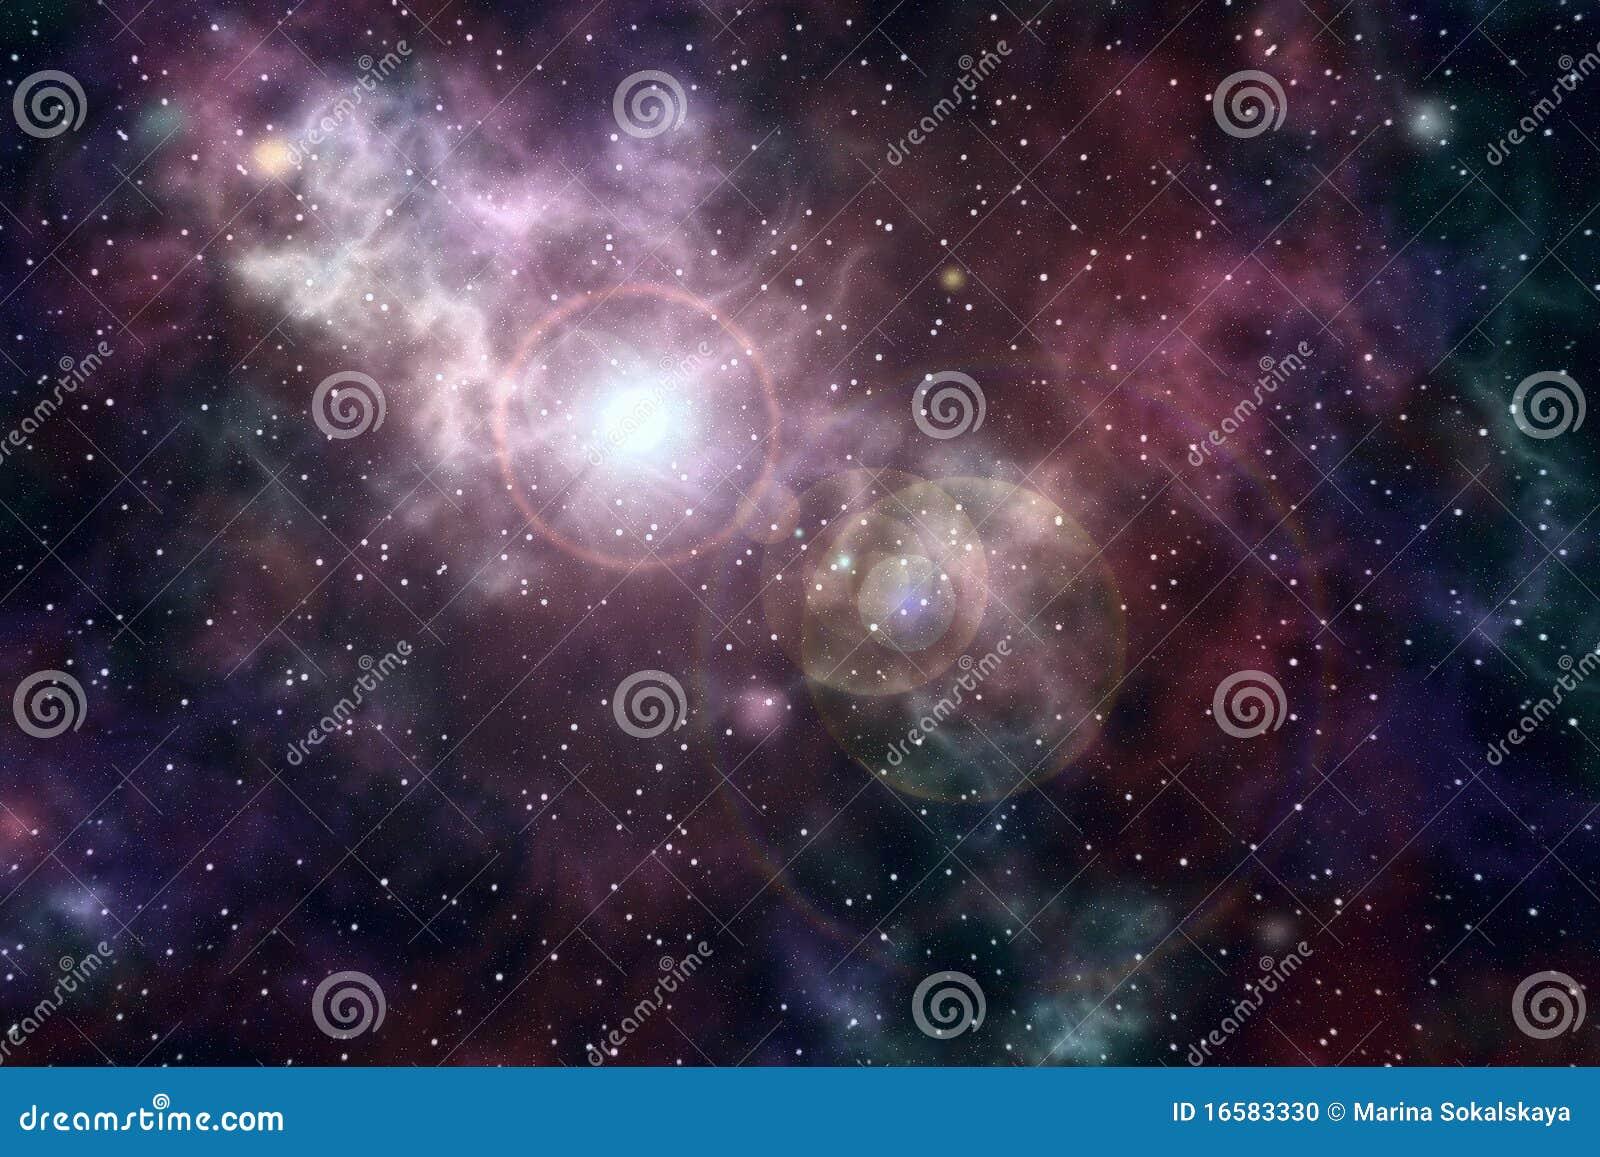 supernova landscape - photo #10